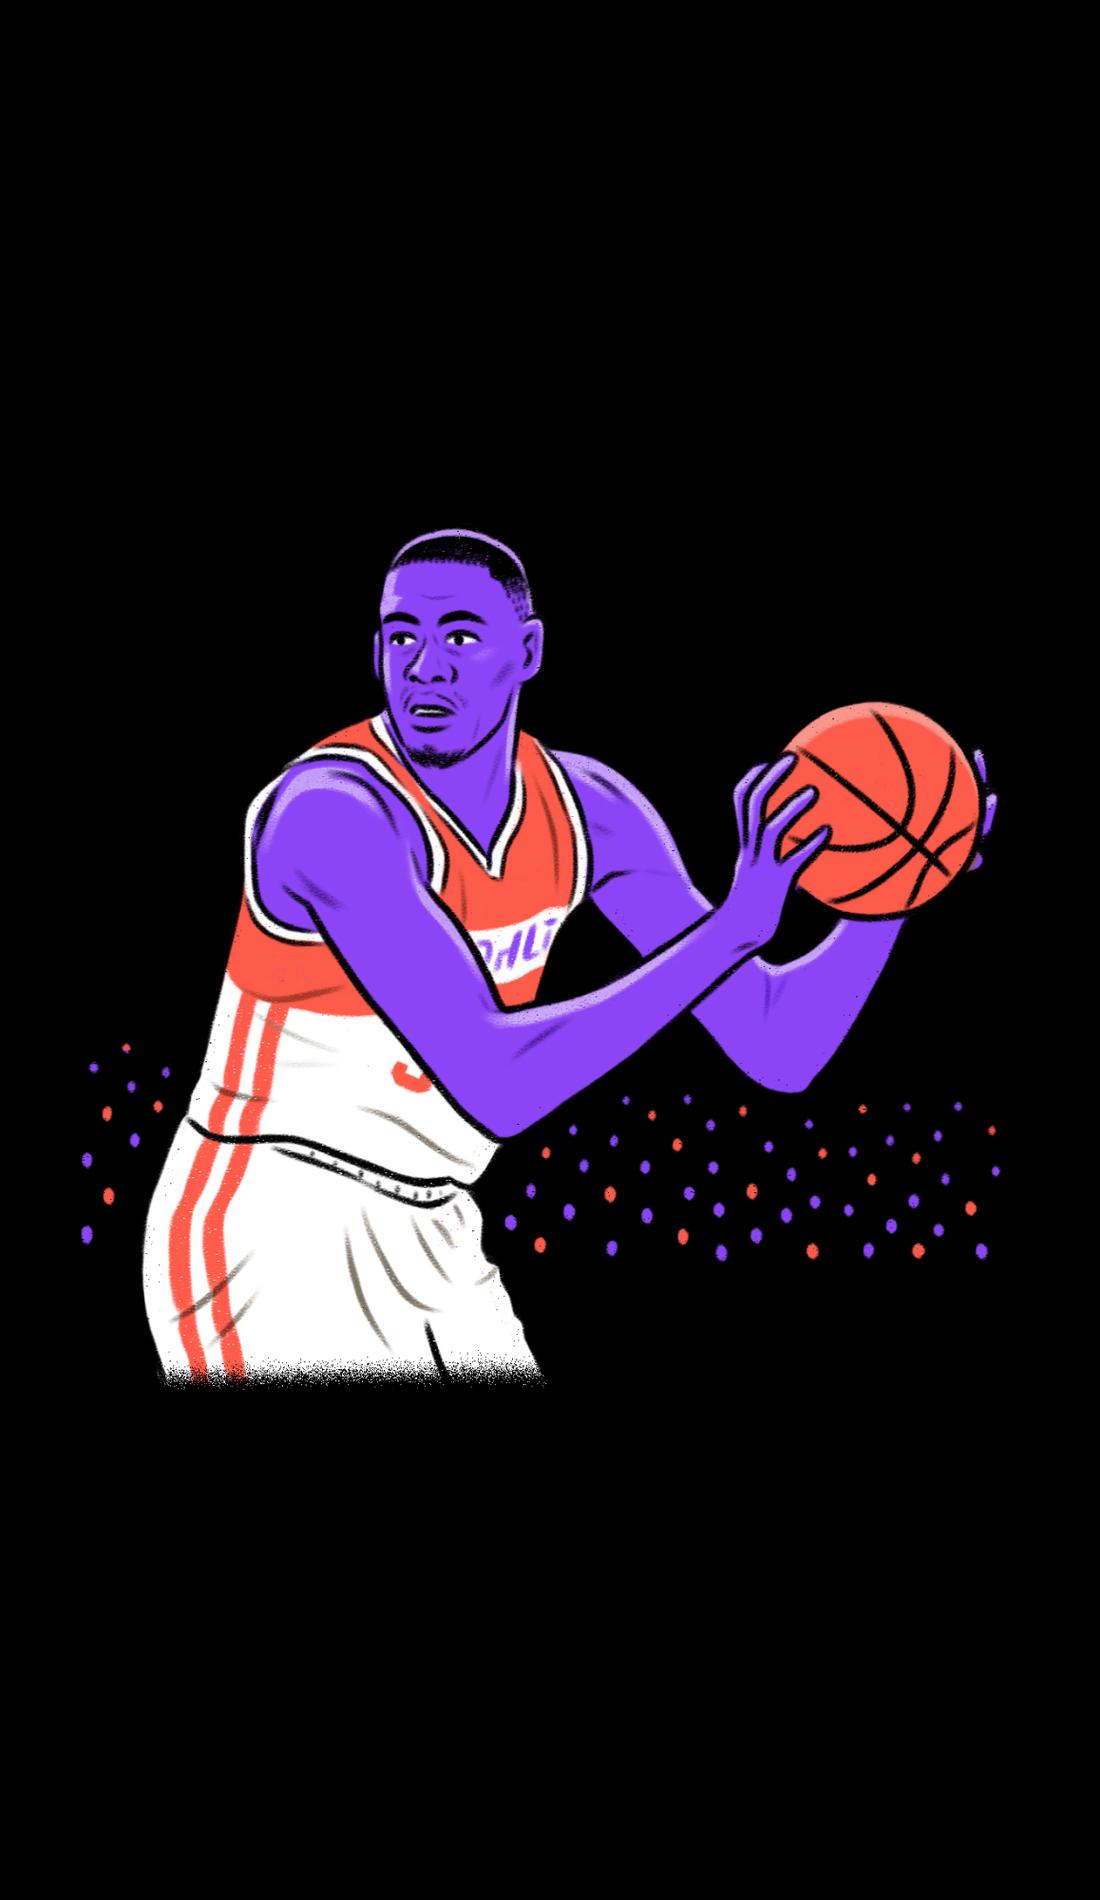 A Alabama Crimson Tide Basketball live event